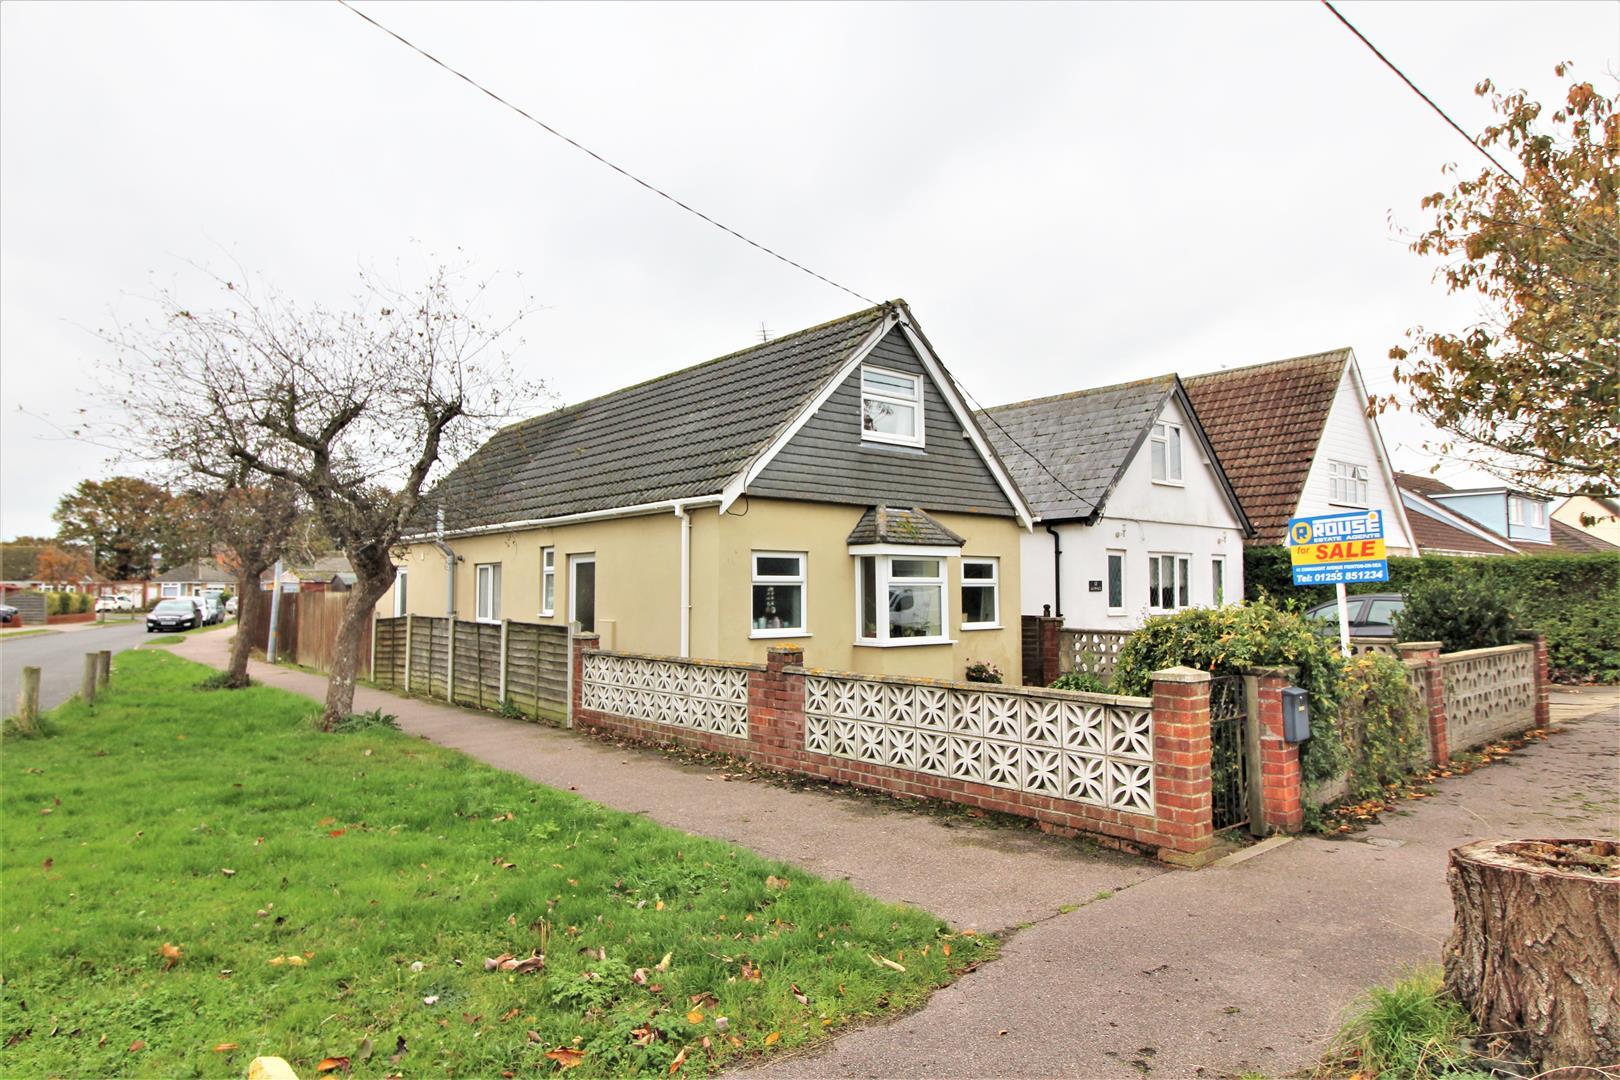 Willow Avenue, Frinton-On-Sea, Essex, CO13 0PR